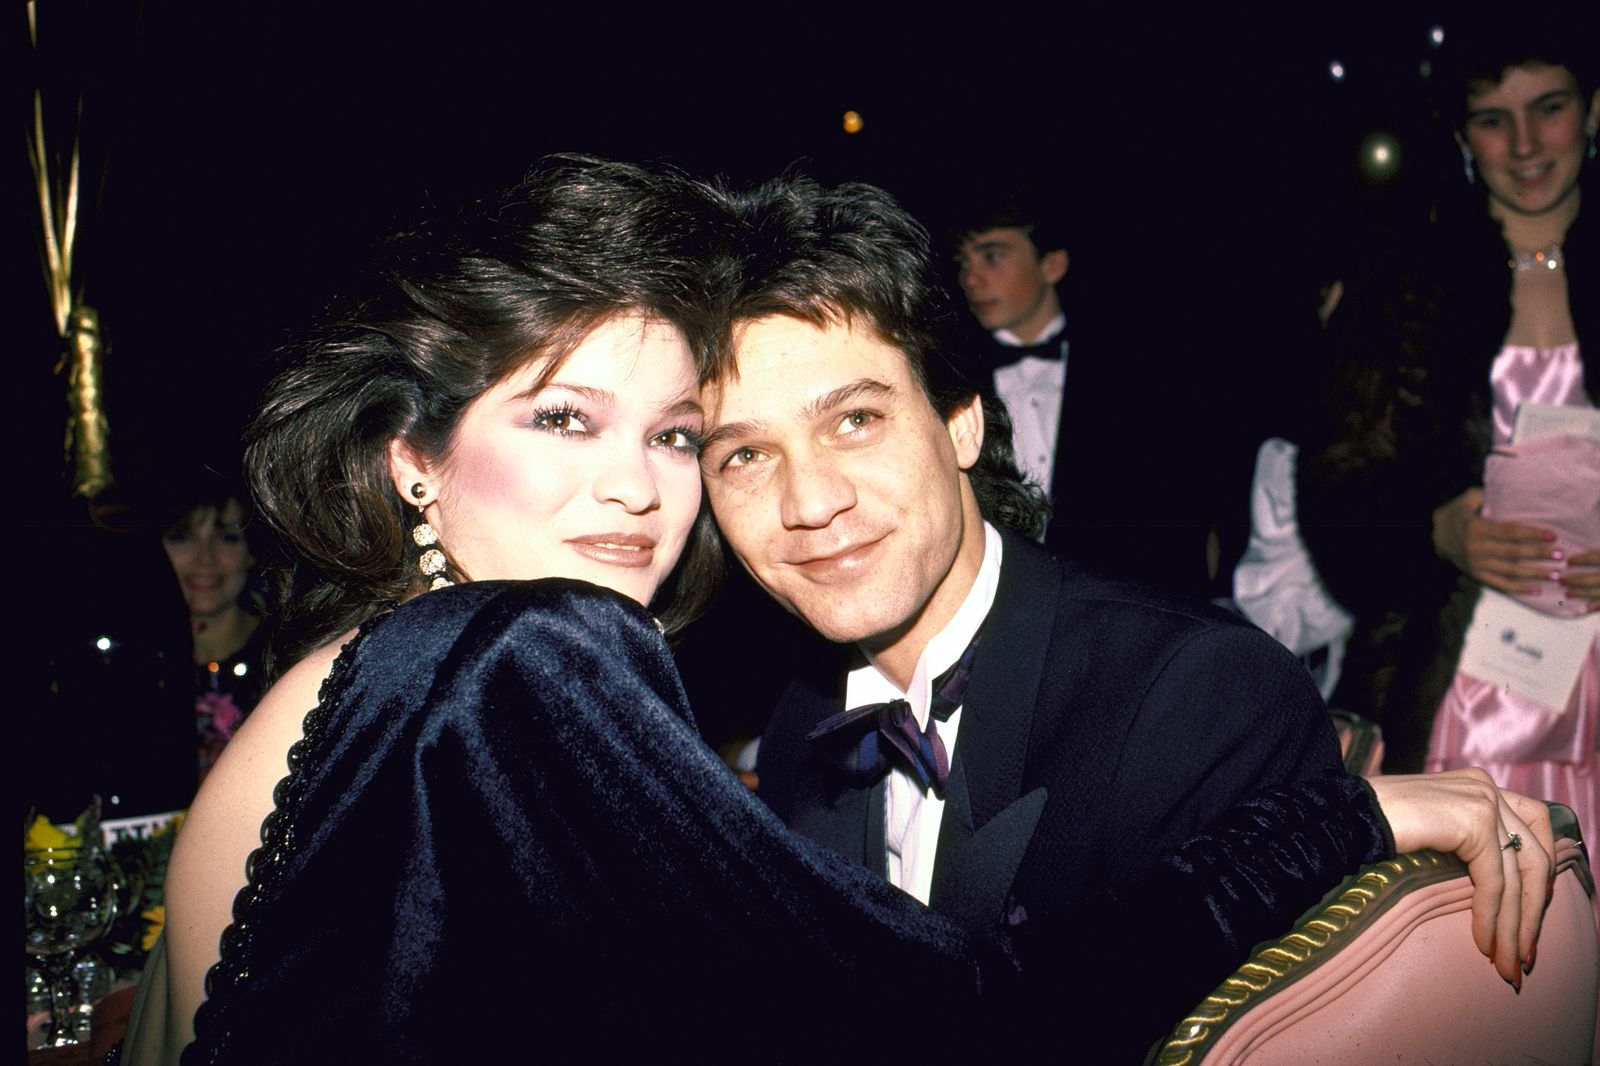 Valerie Bertinelli;Eddie Van Halen [& Wife]